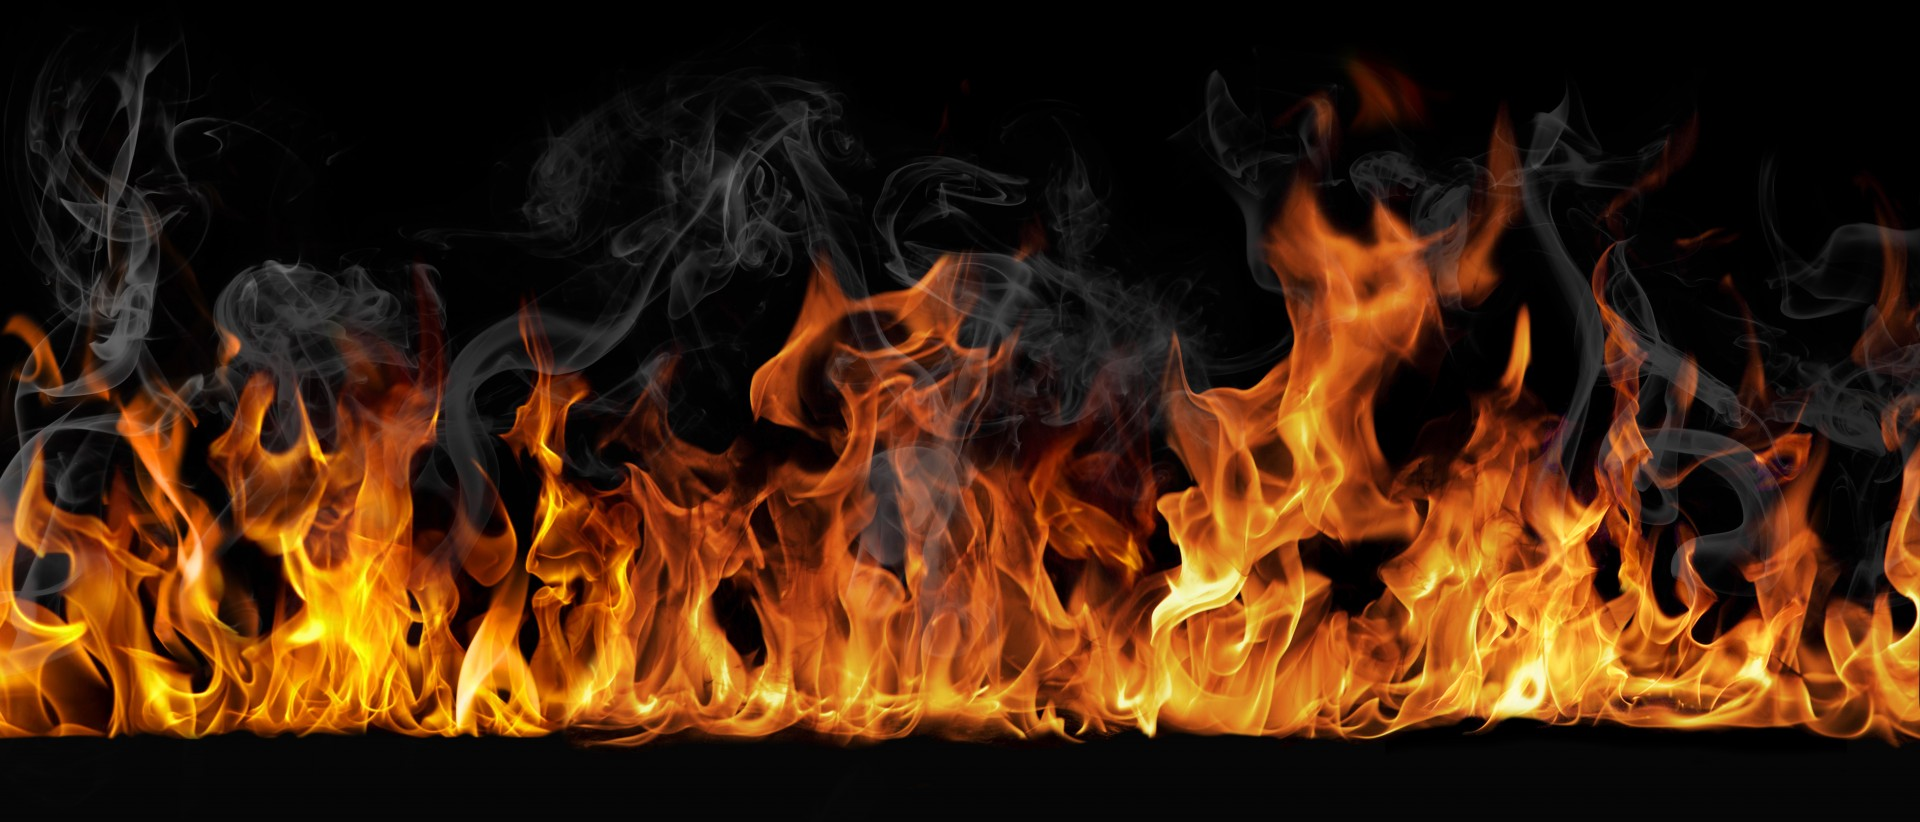 Burn The Floor Fire and Smoke Image